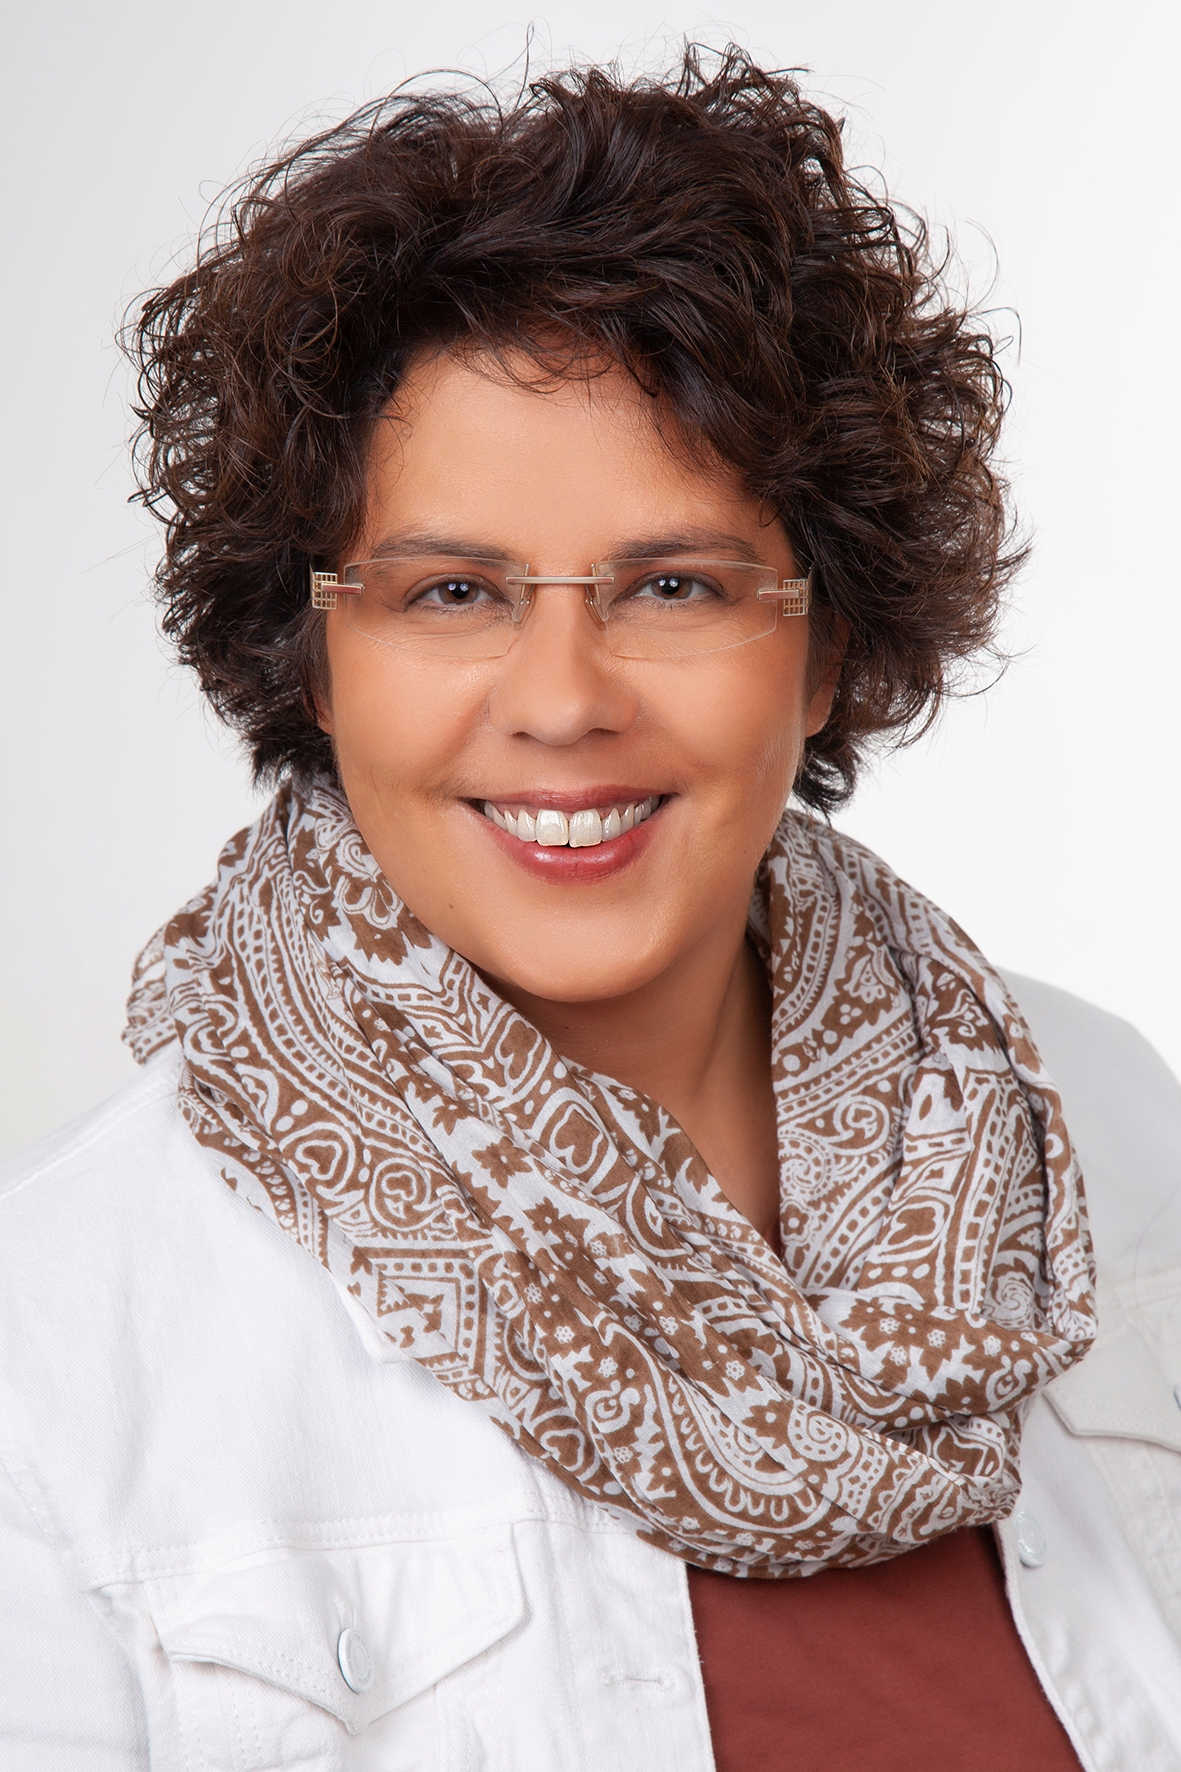 Claudia Kisters